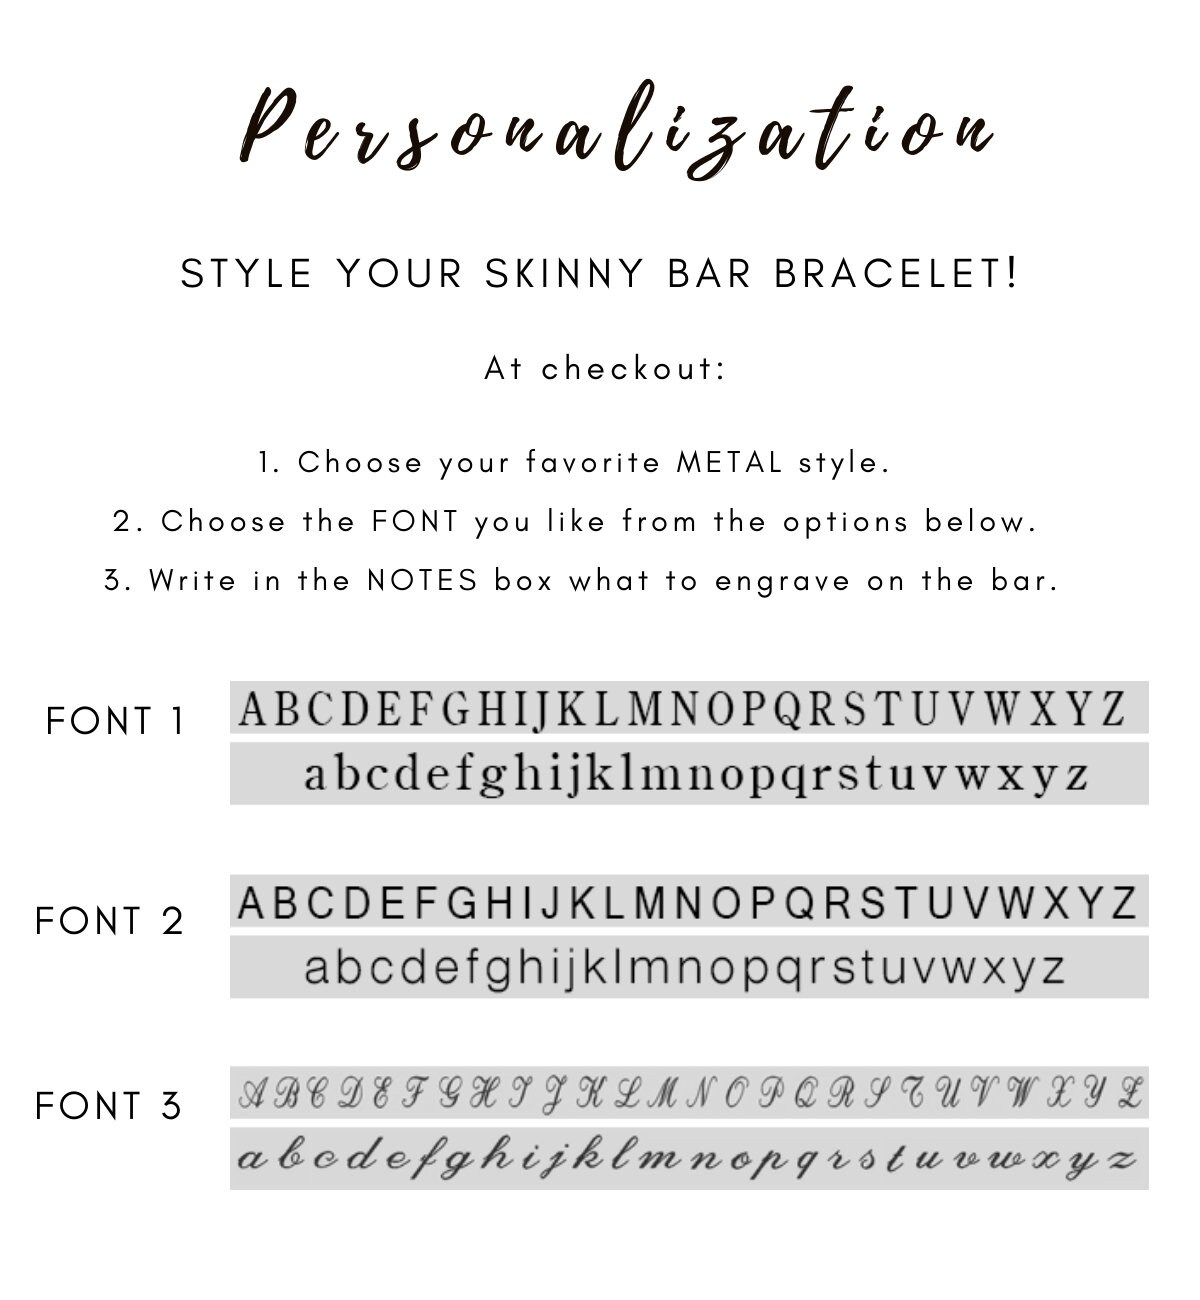 Gold Bar Bracelet Silver Bar Bracelet Personalized Bracelet image 3